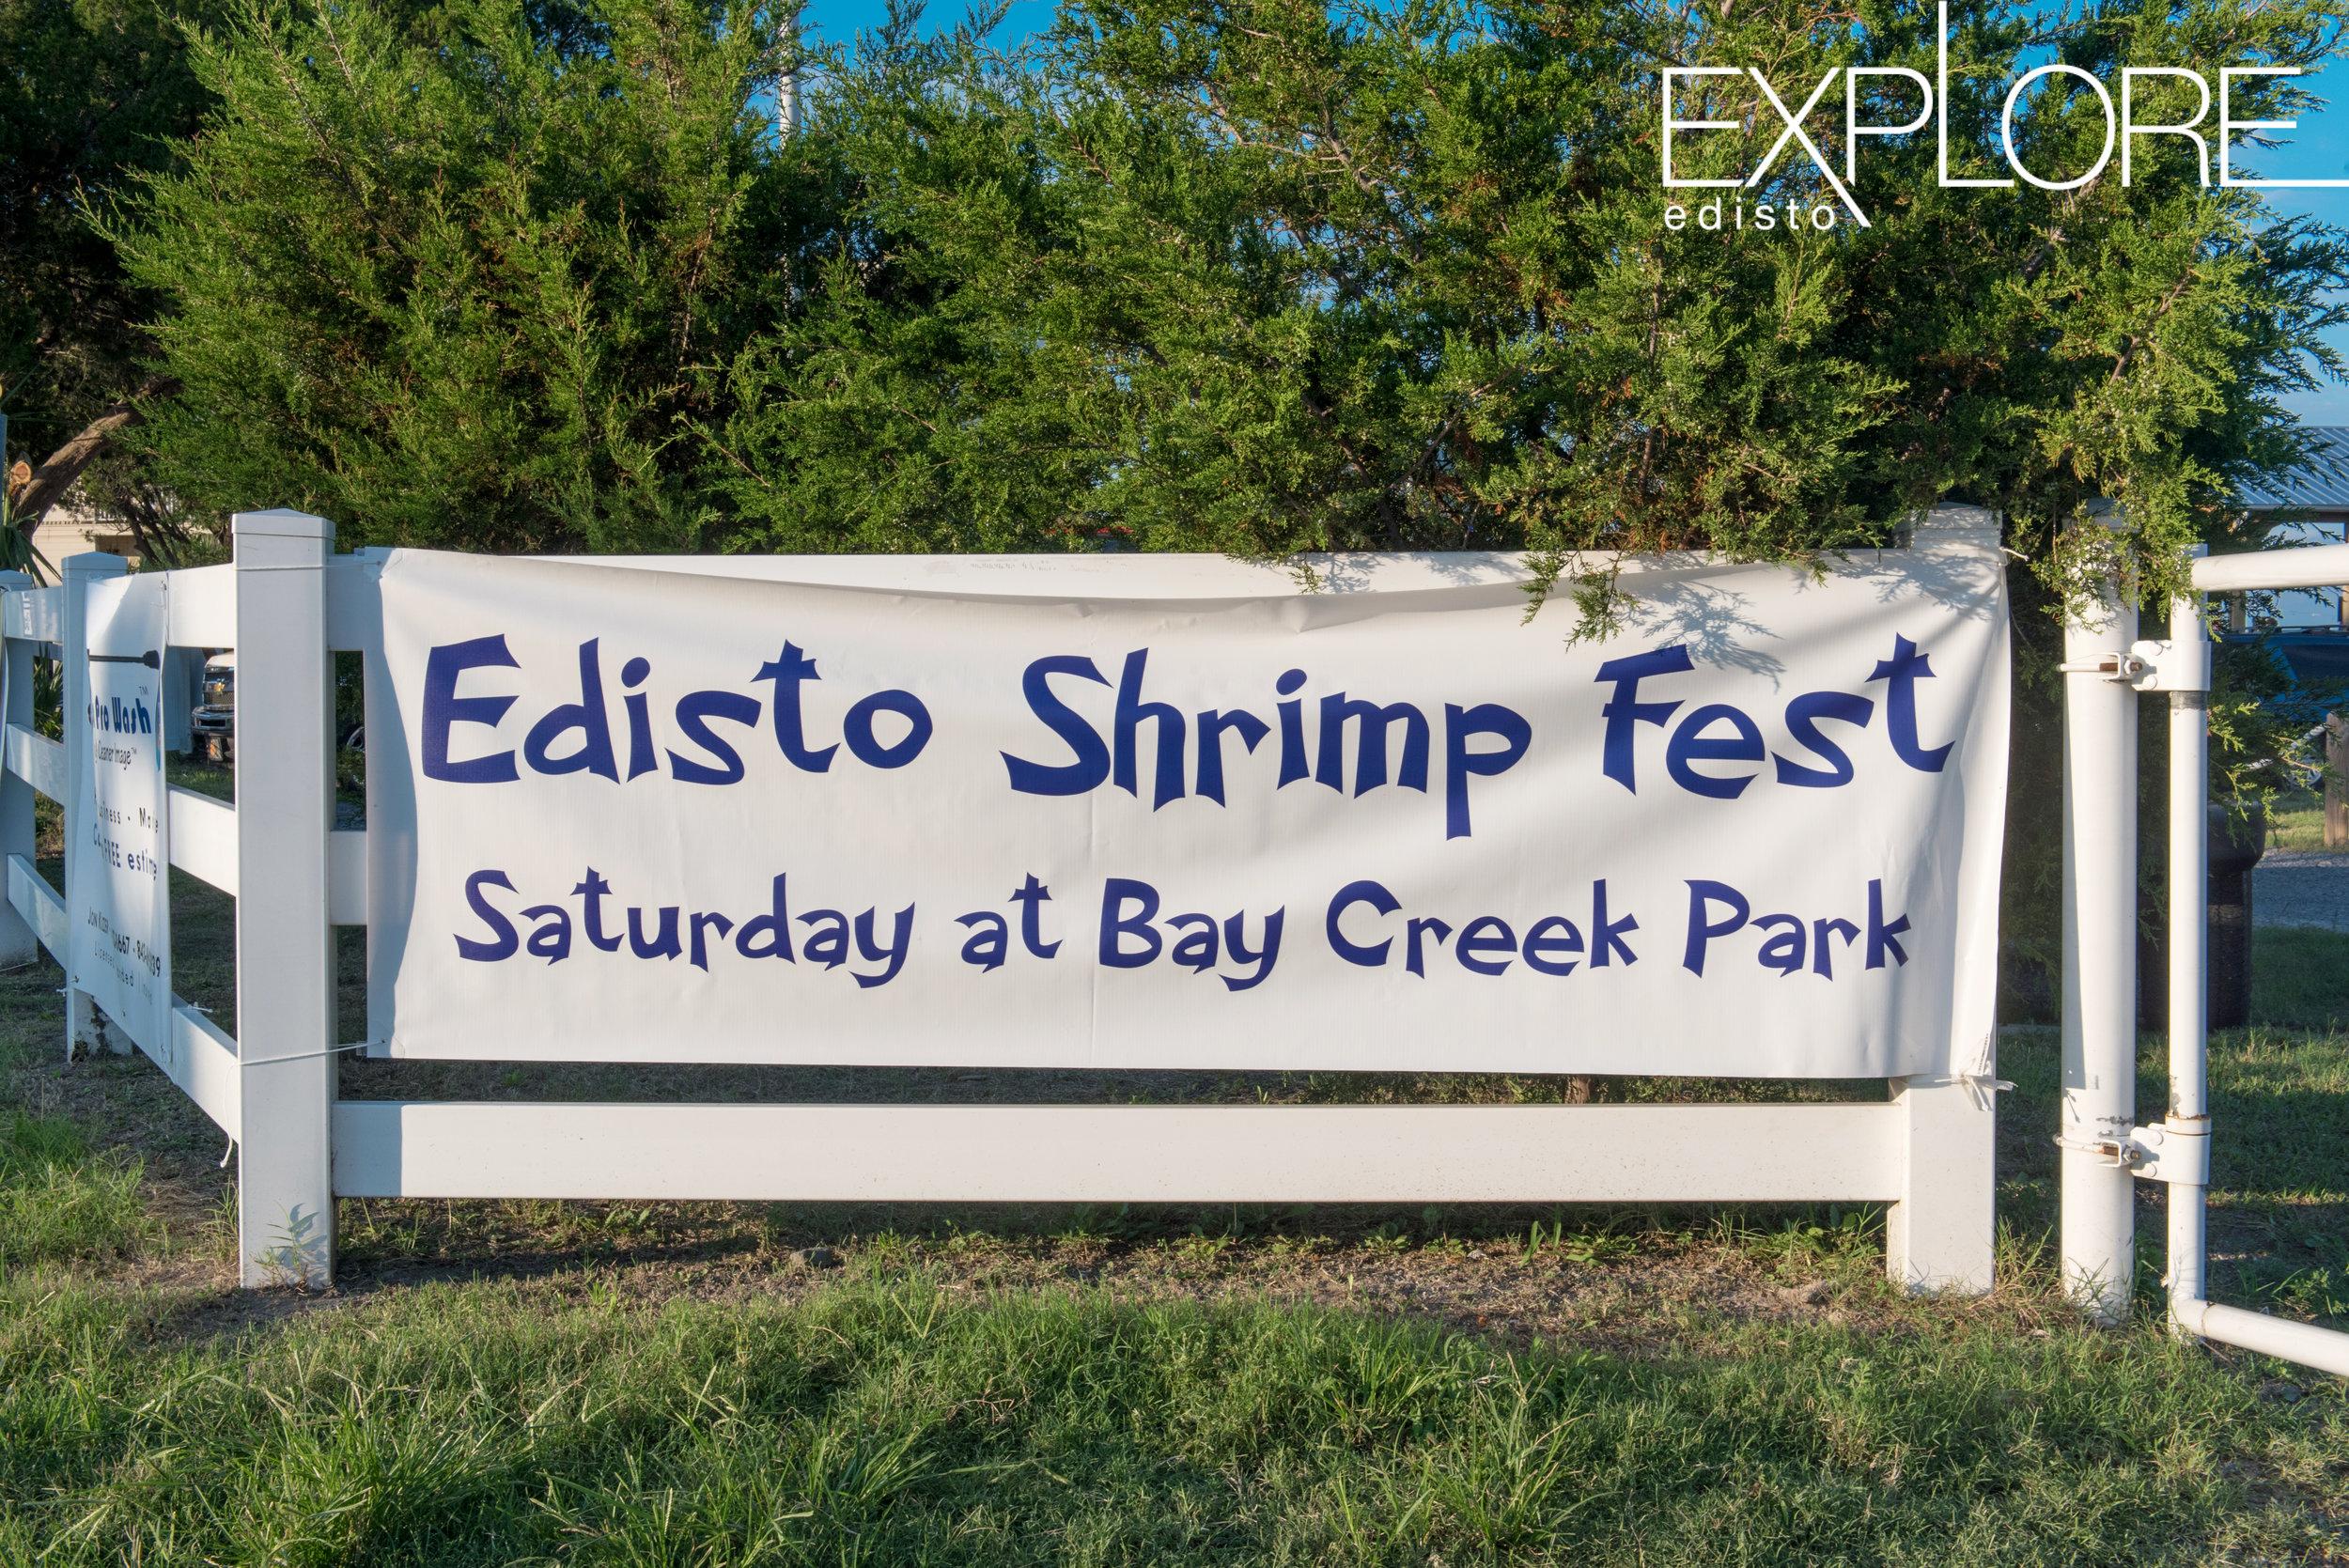 Edisto Shrimp Fest 2016